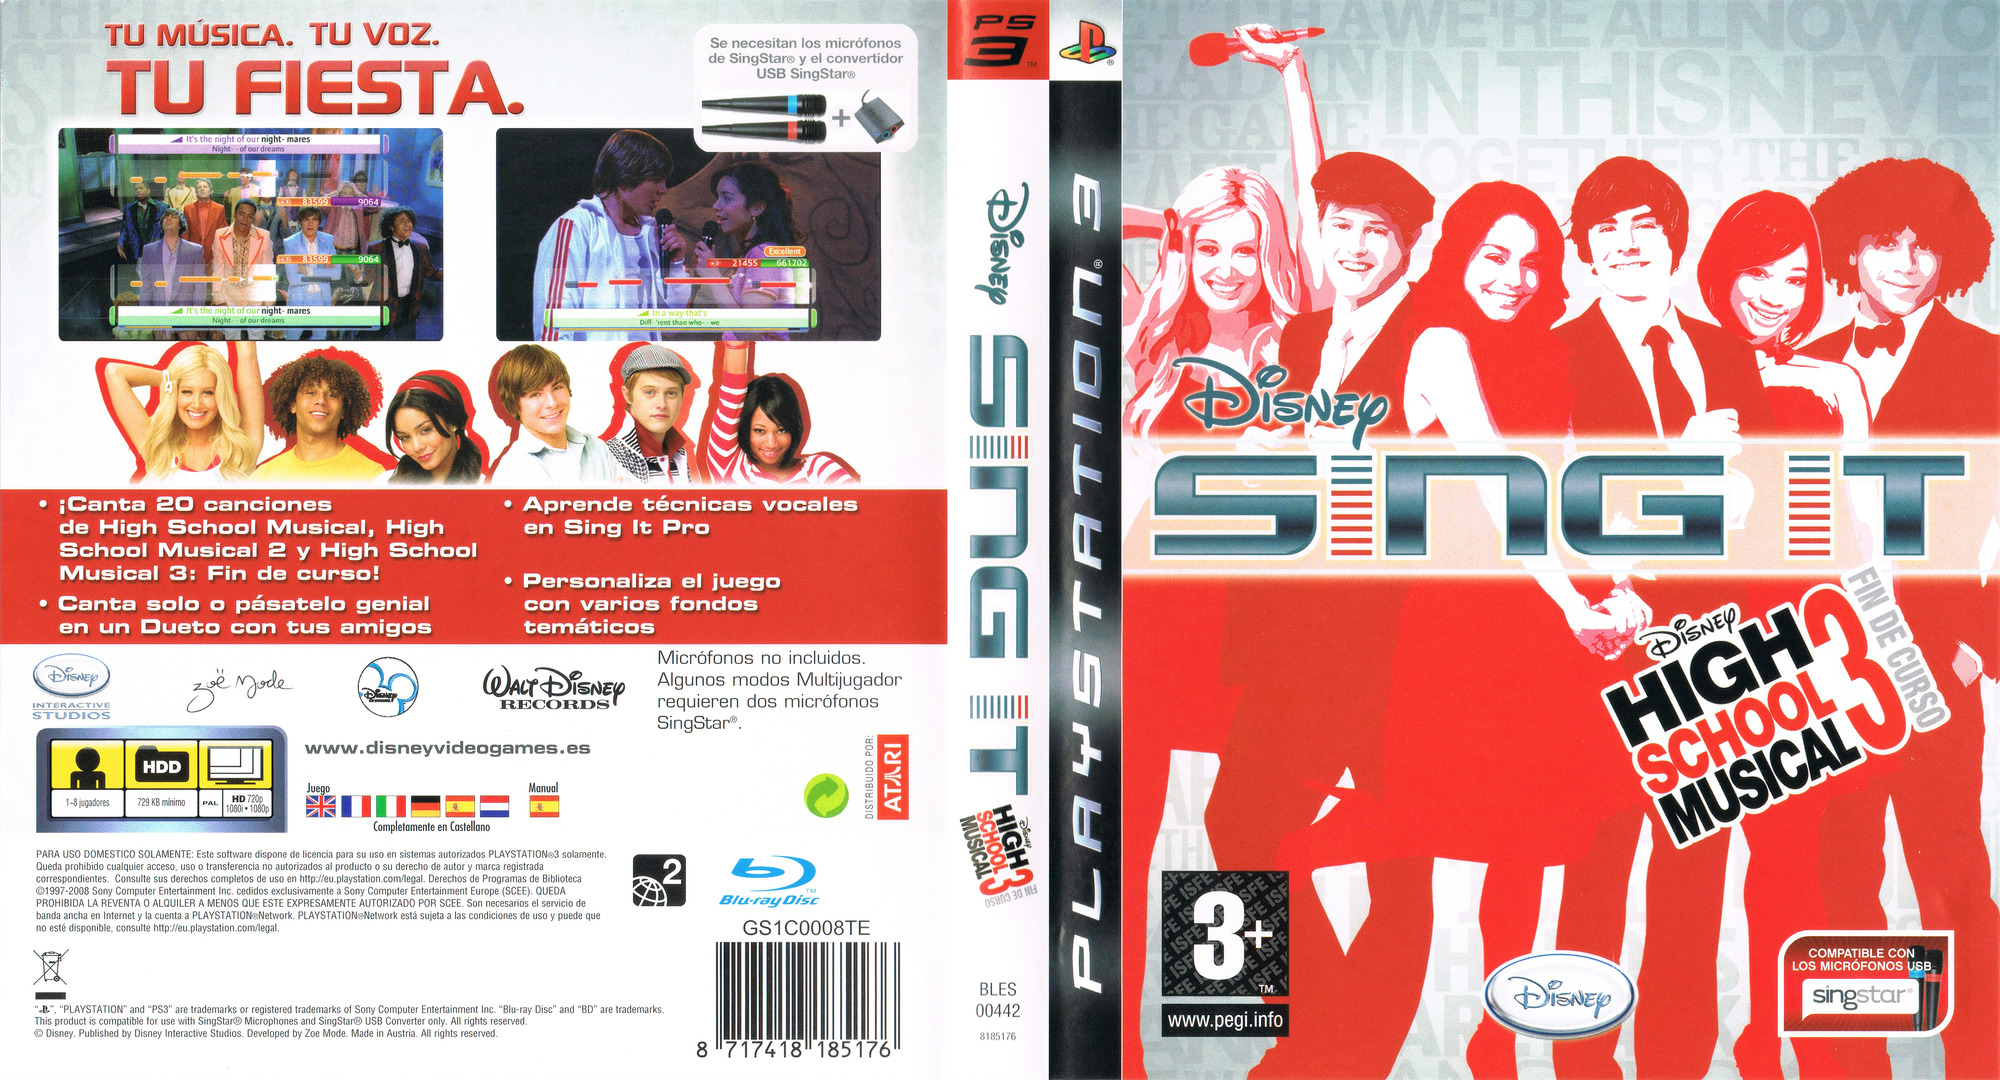 Bles00442 Disney Sing It High School Musical 3 Senior Year